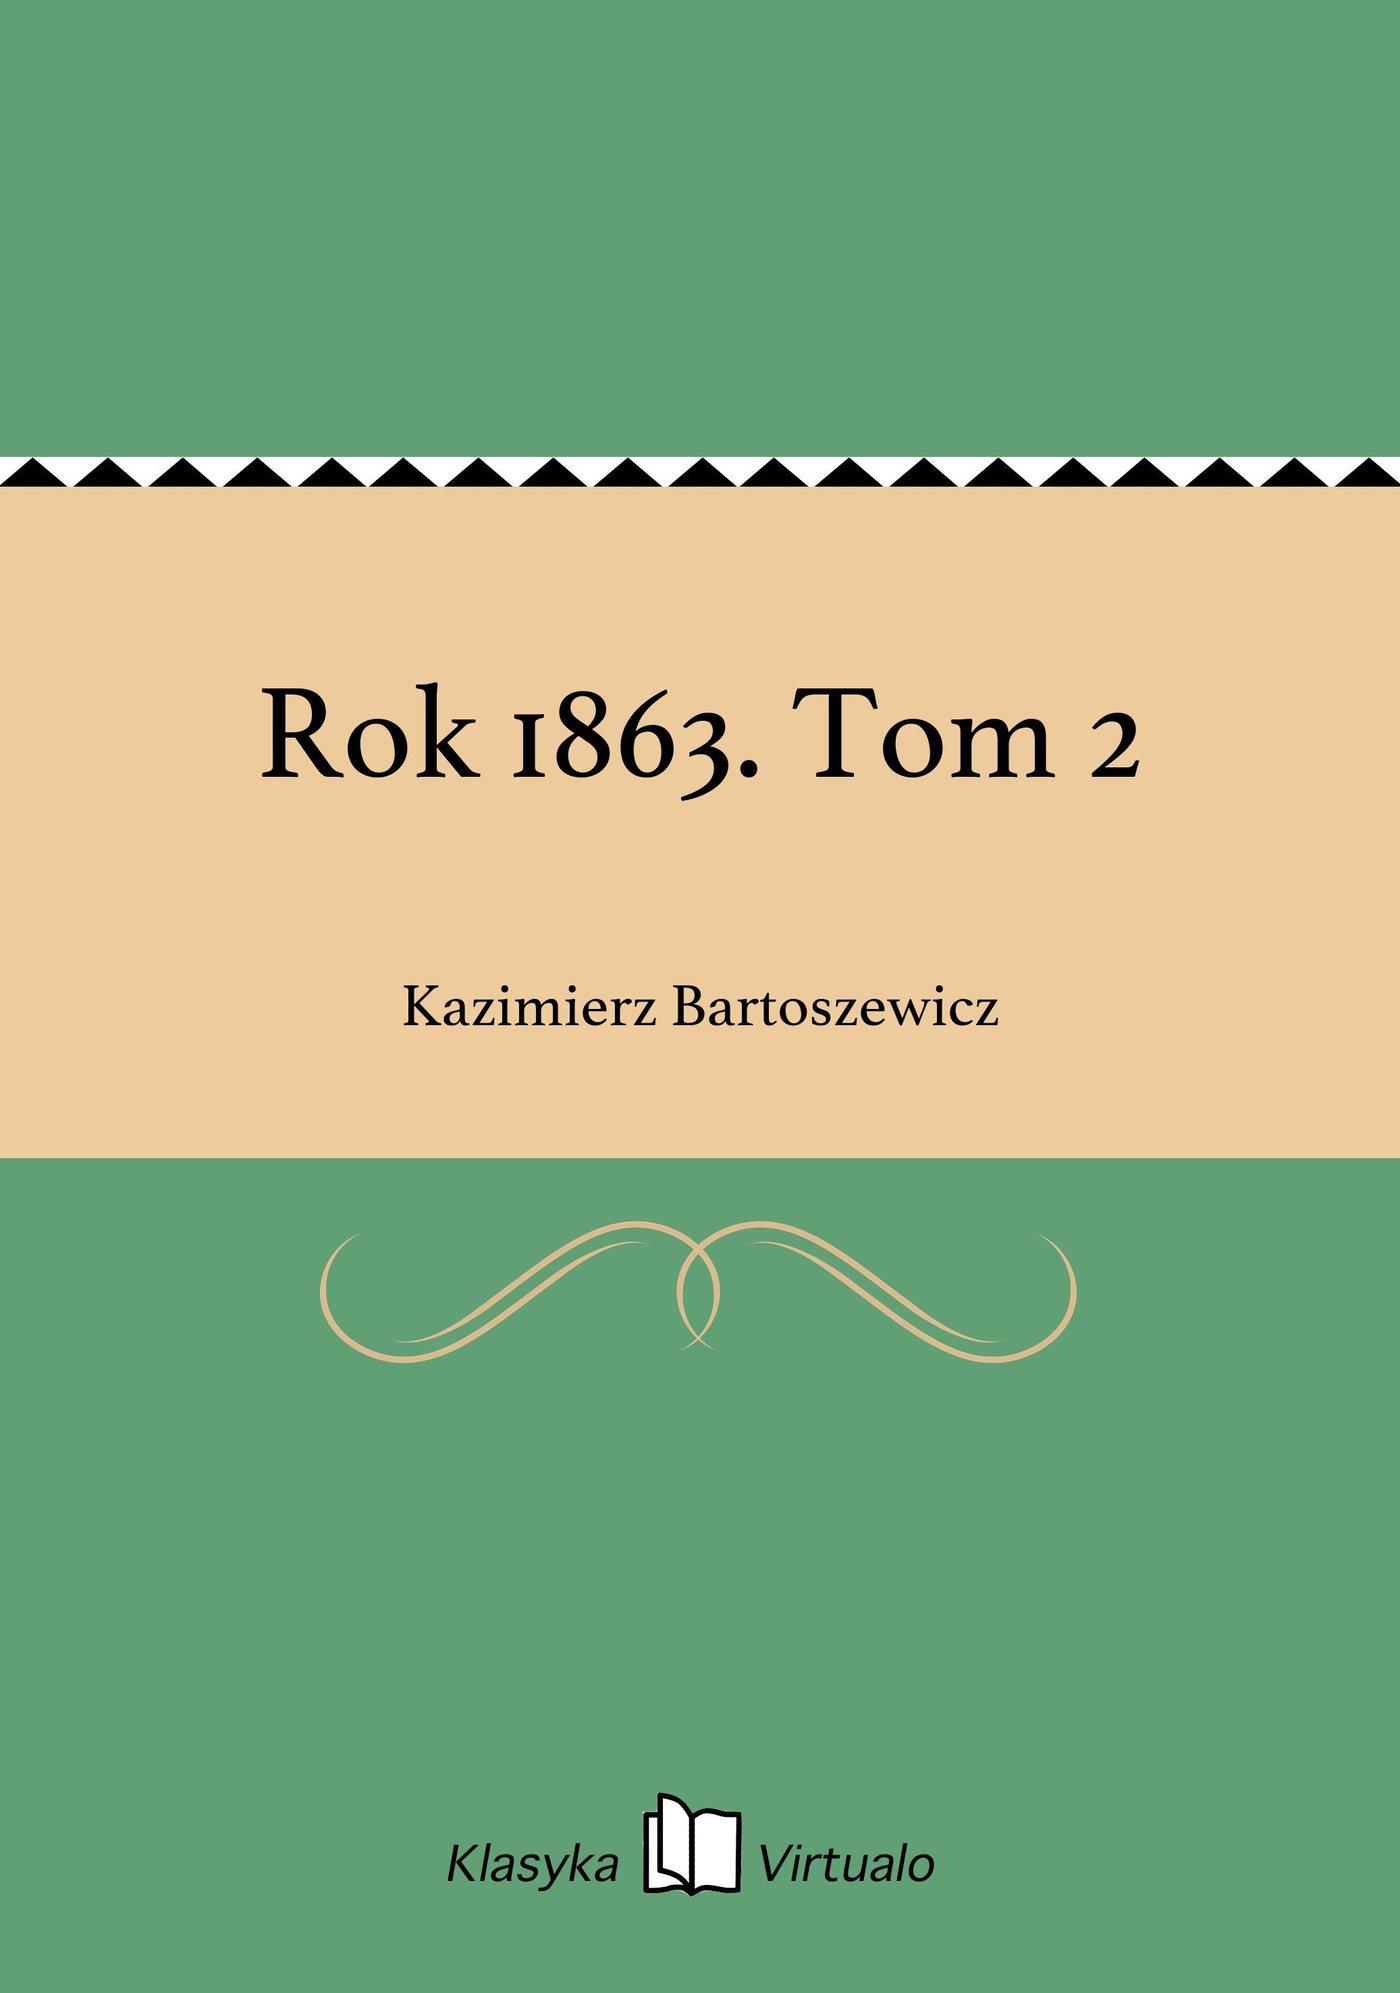 Rok 1863. Tom 2 - Ebook (Książka EPUB) do pobrania w formacie EPUB